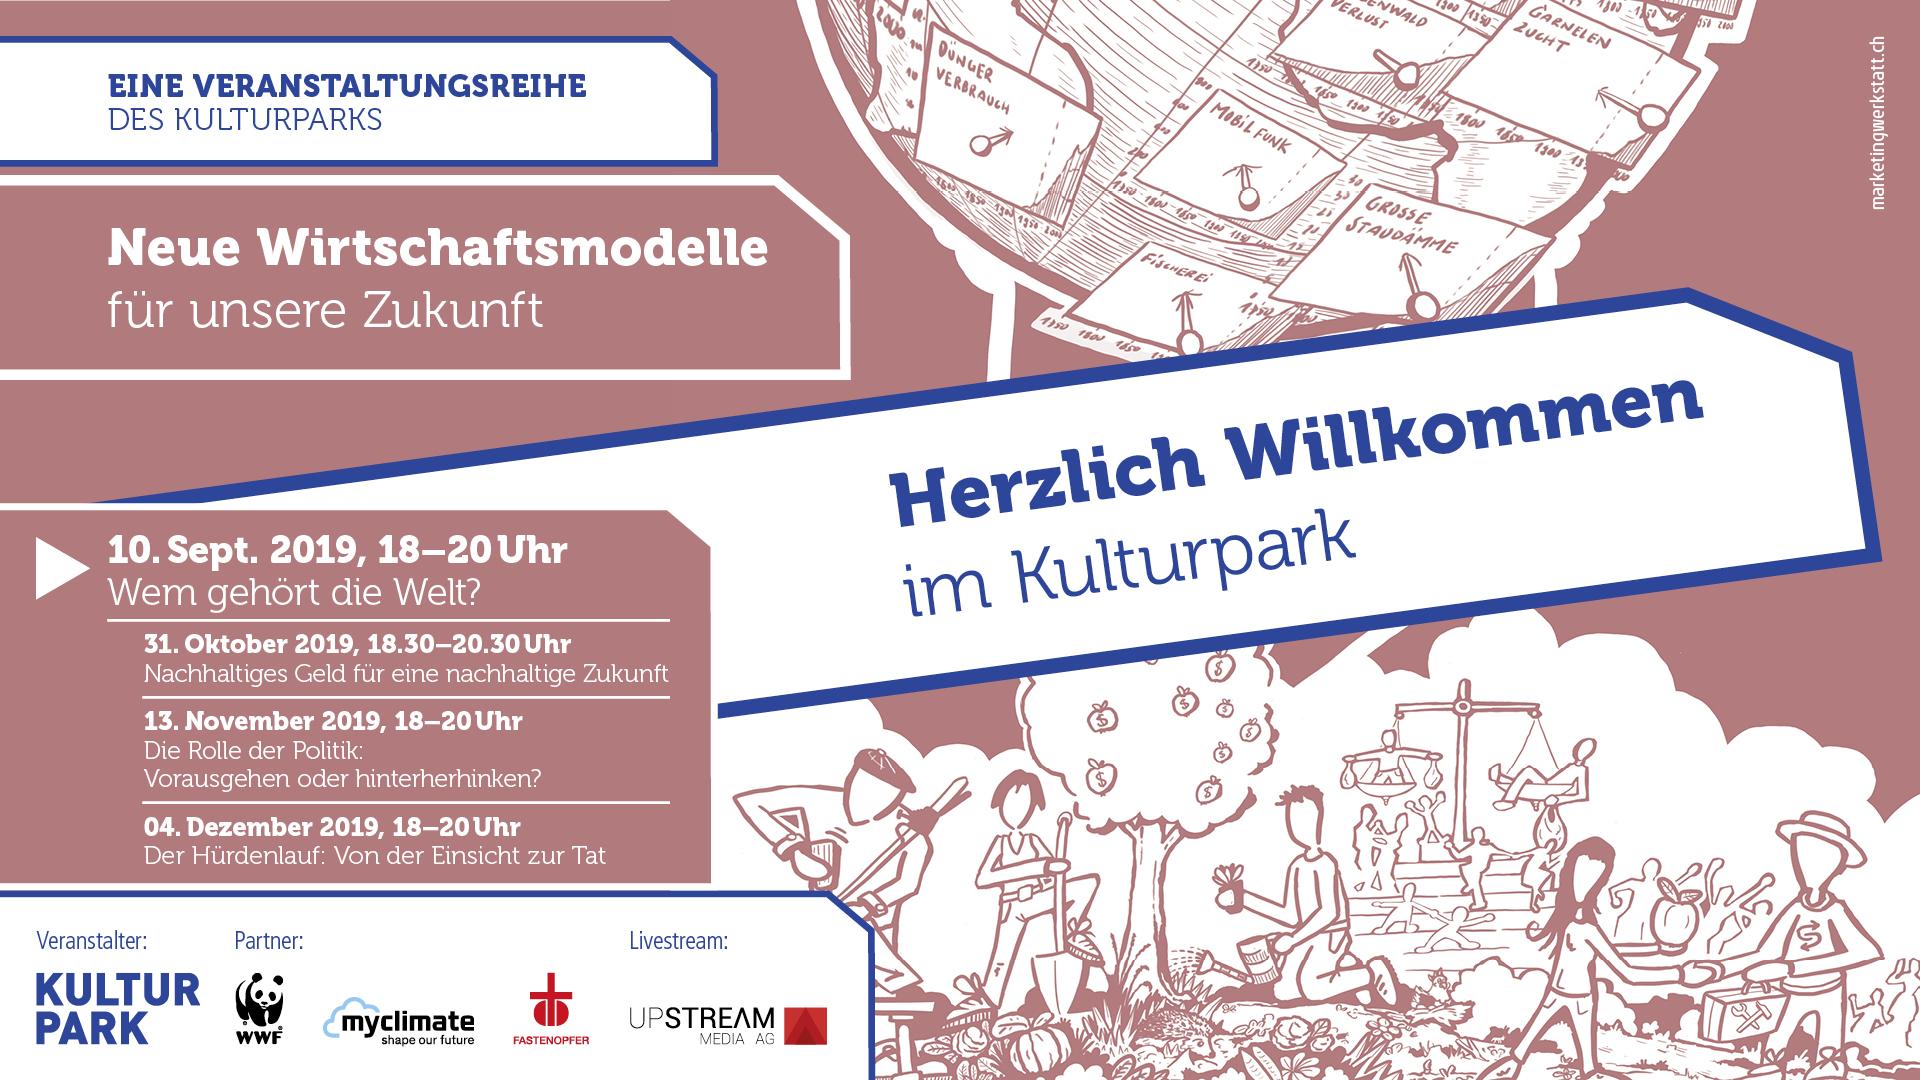 Grafik: https://www.kulturpark.ch/neuewirtschaft/